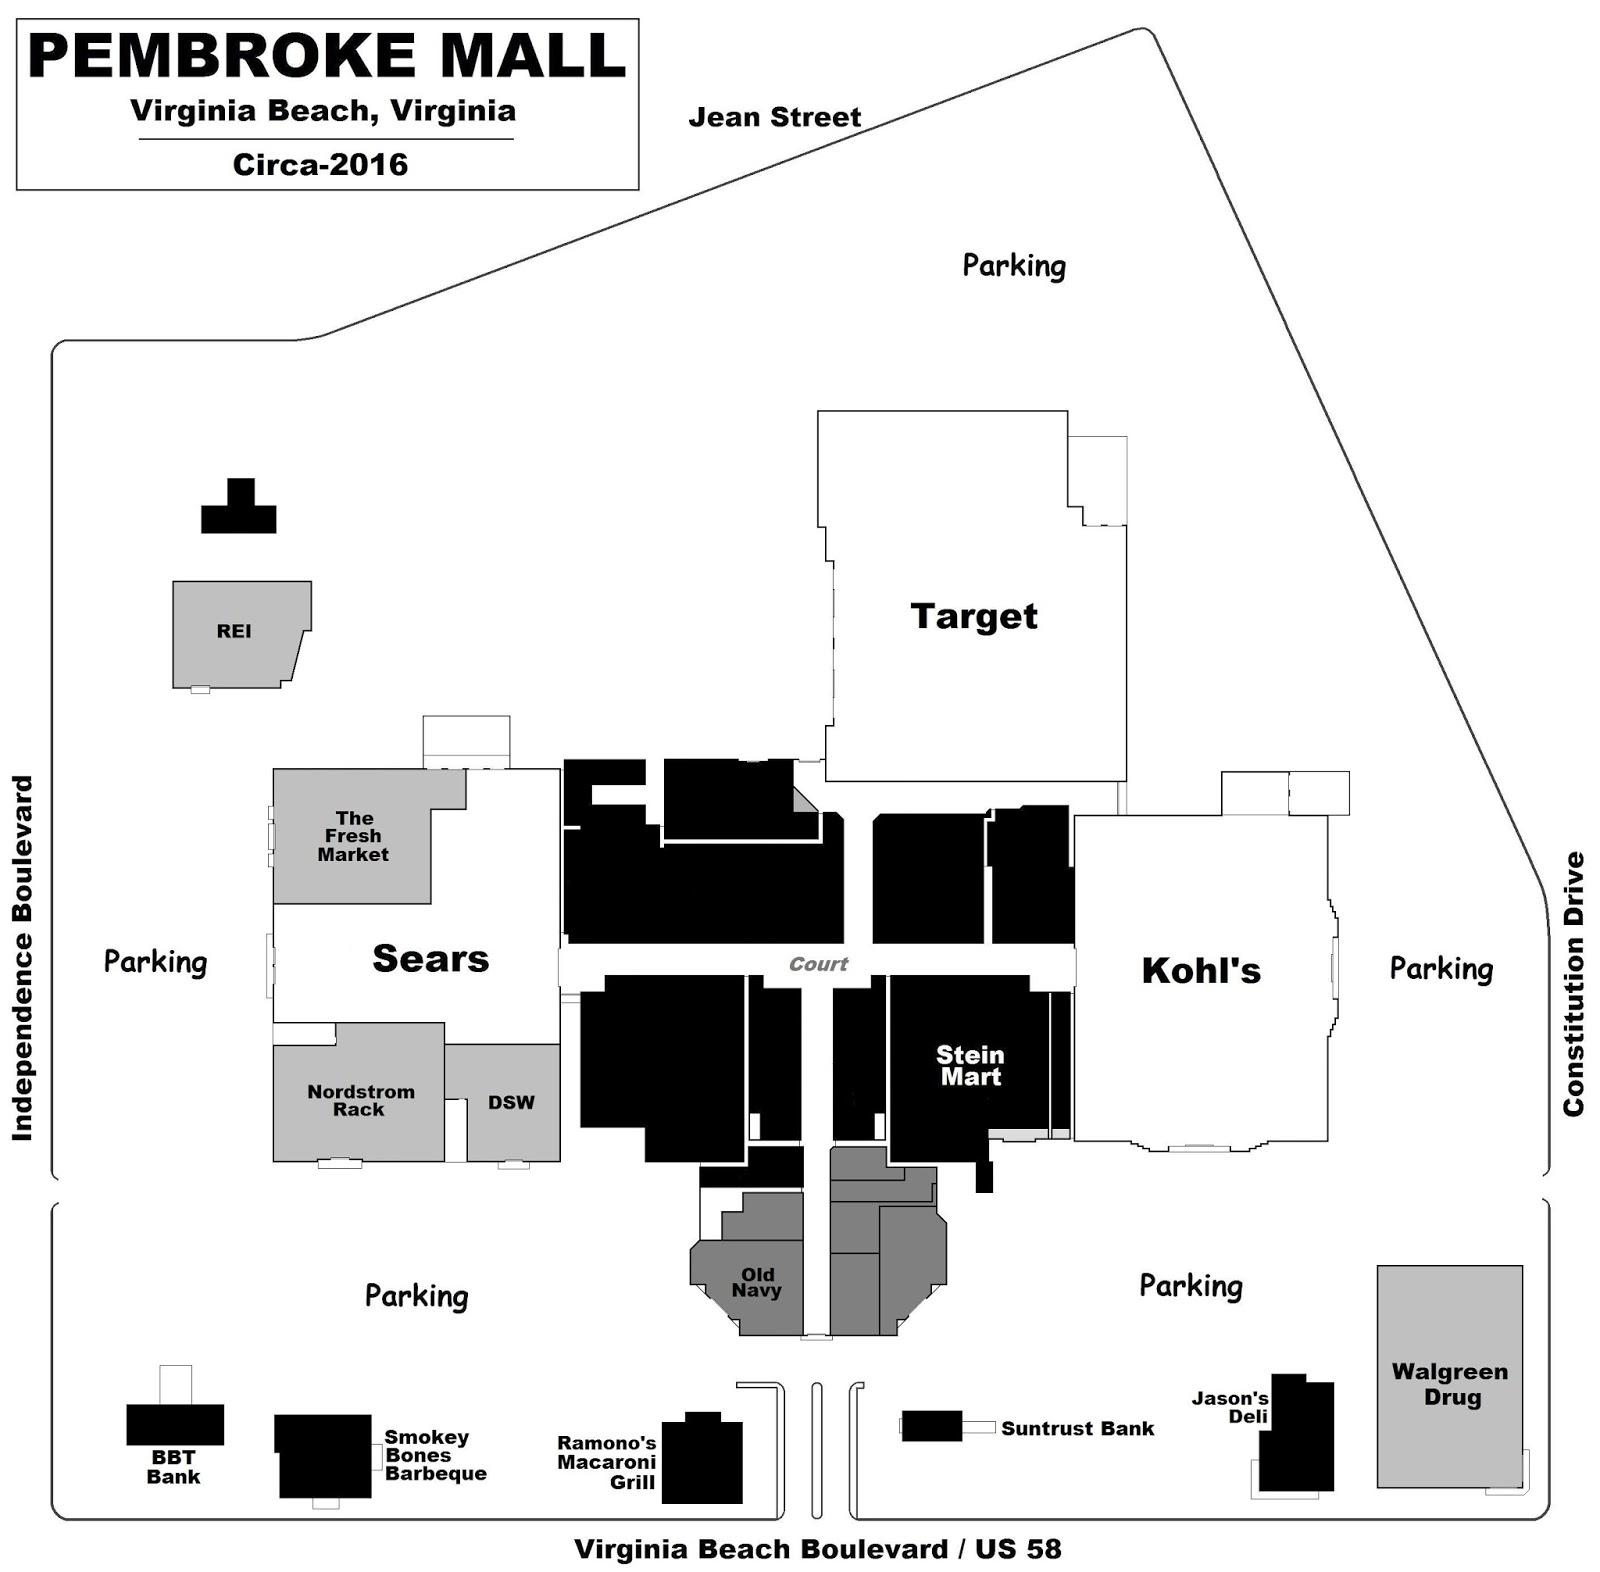 Fresh Market Pembroke Mall